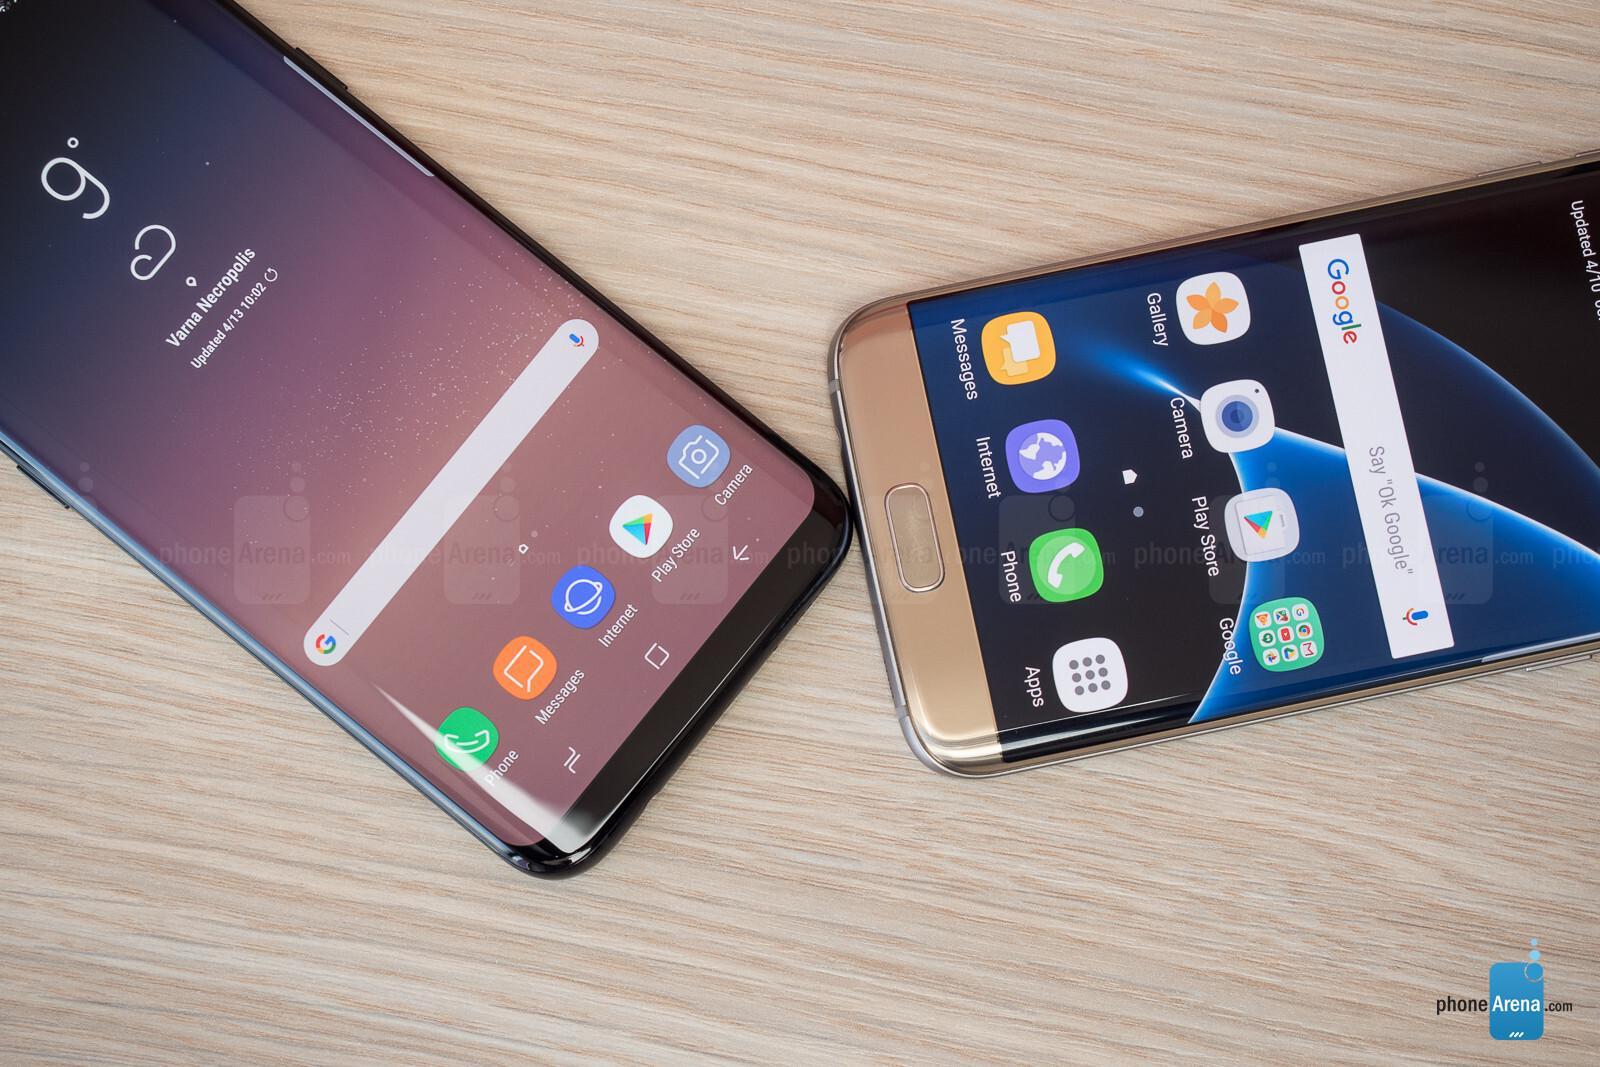 Samsung Galaxy S8+ vs S7 Edge - PhoneArena